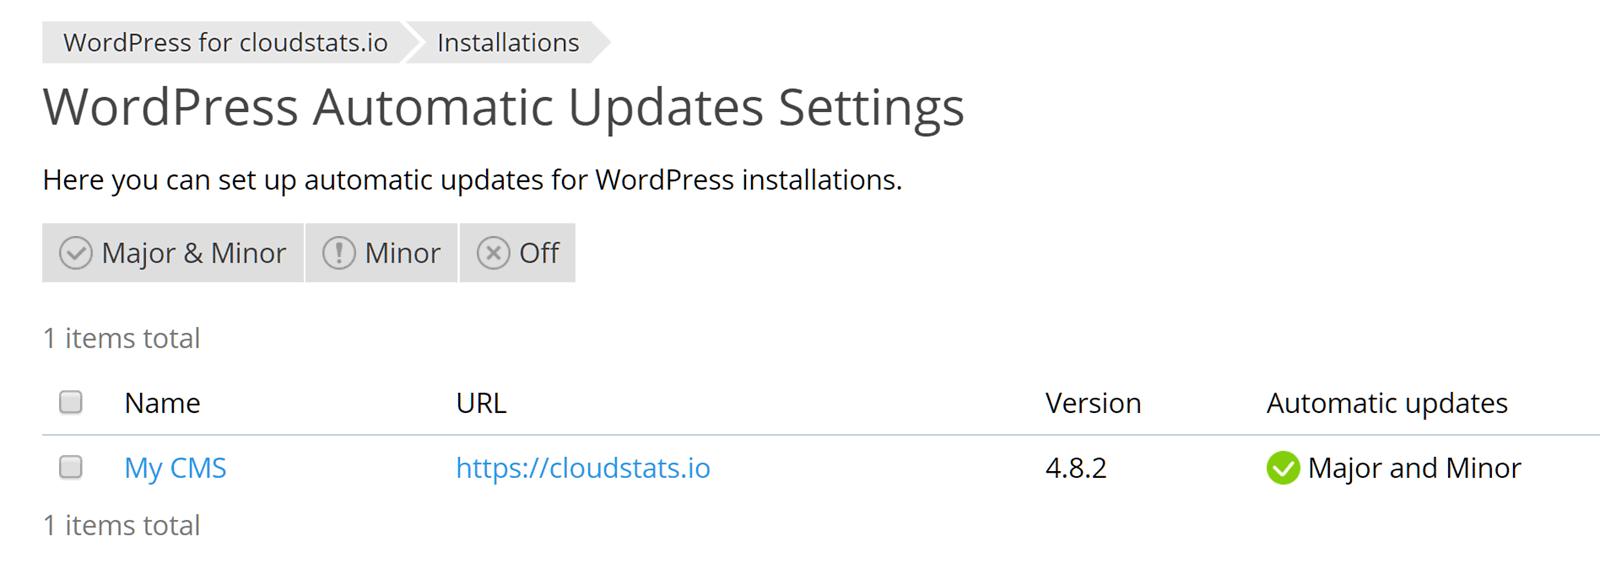 Enable Automatic WordPress Updates